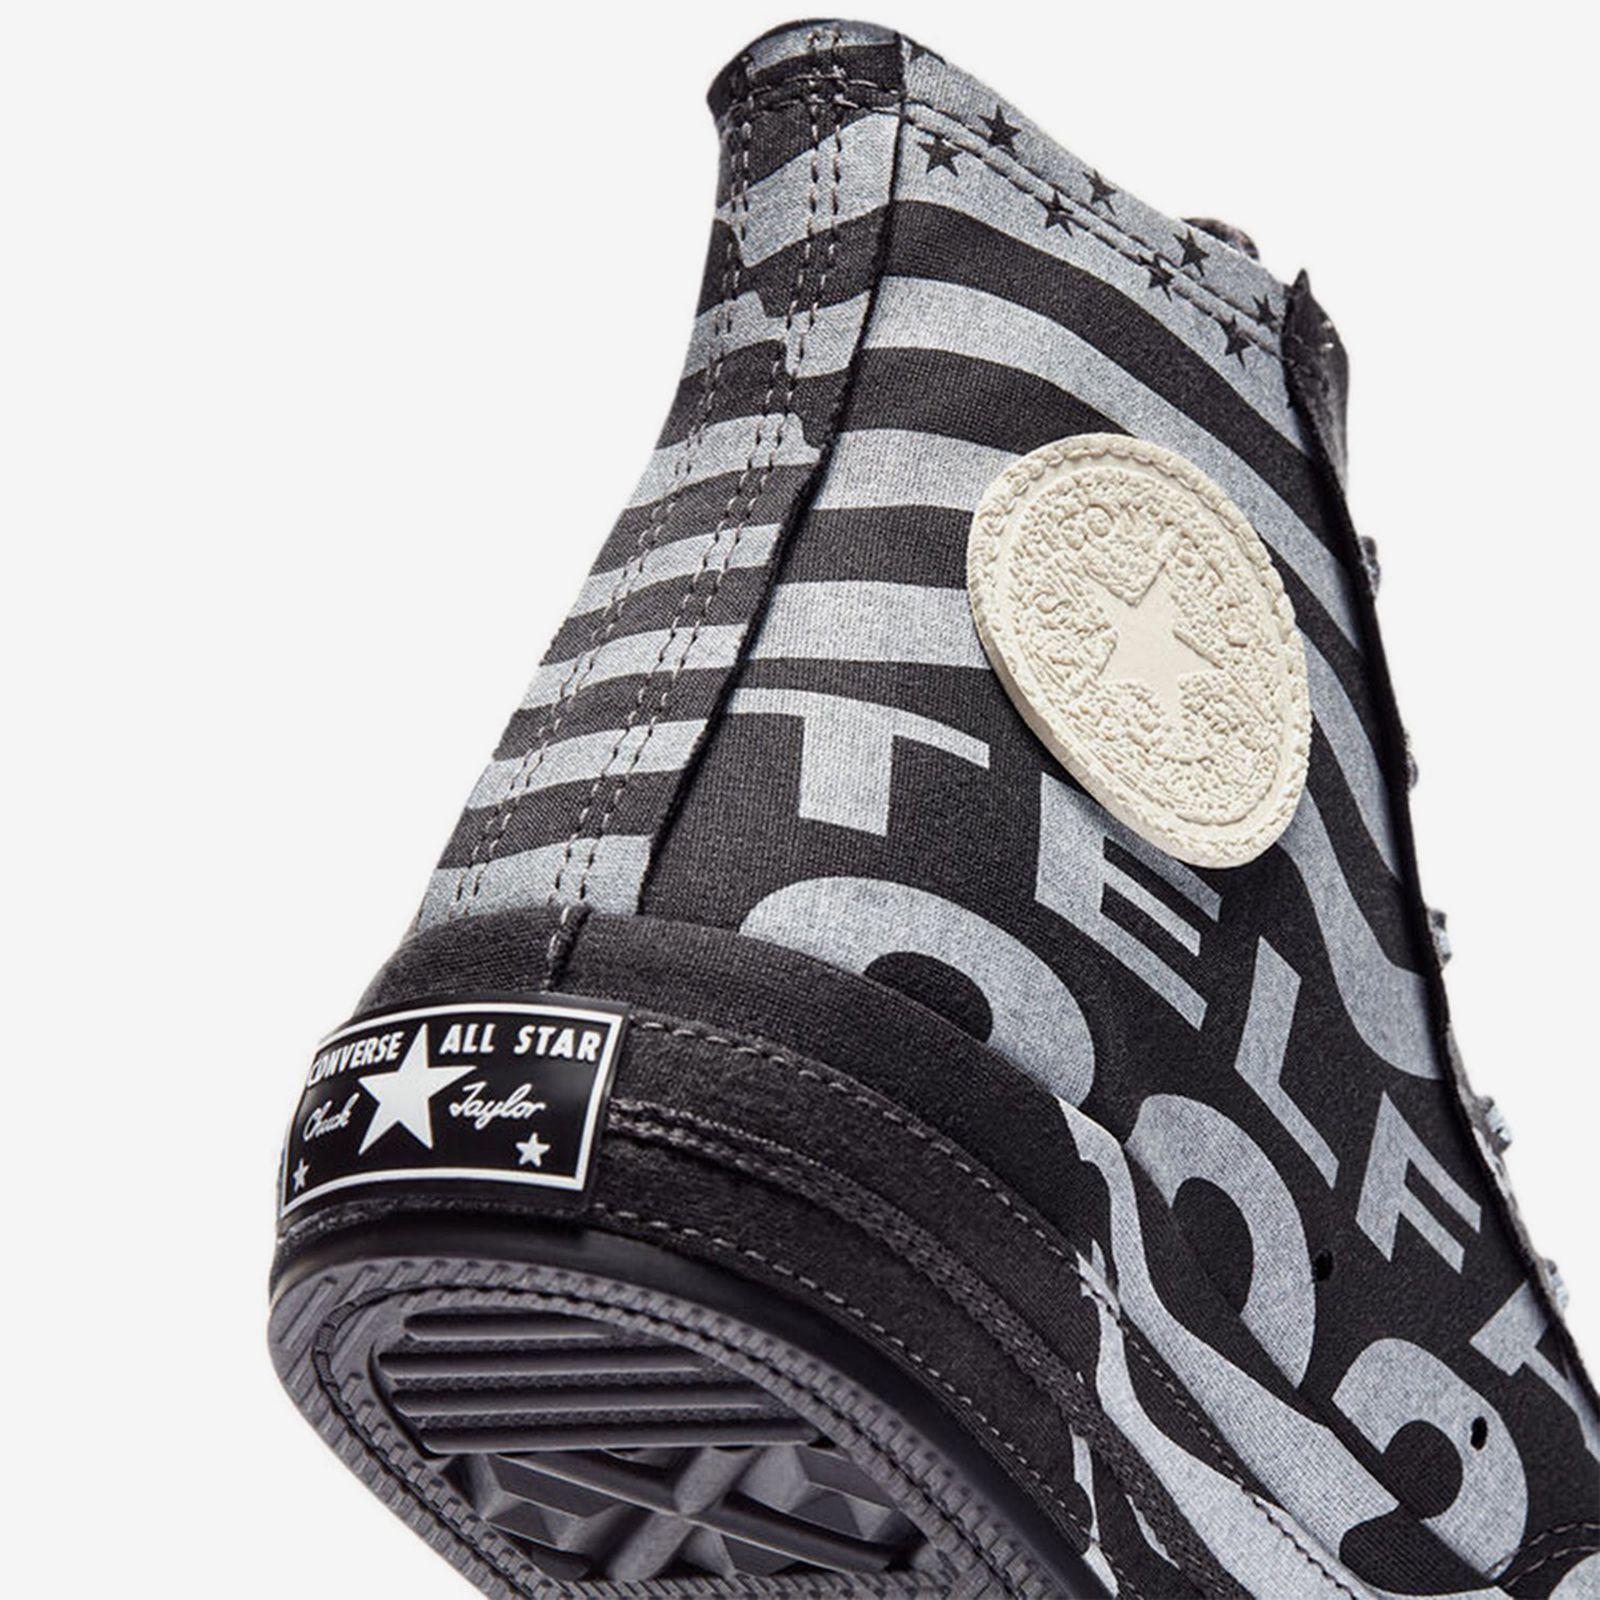 telfar-converse-chuck-70-release-date-price-11